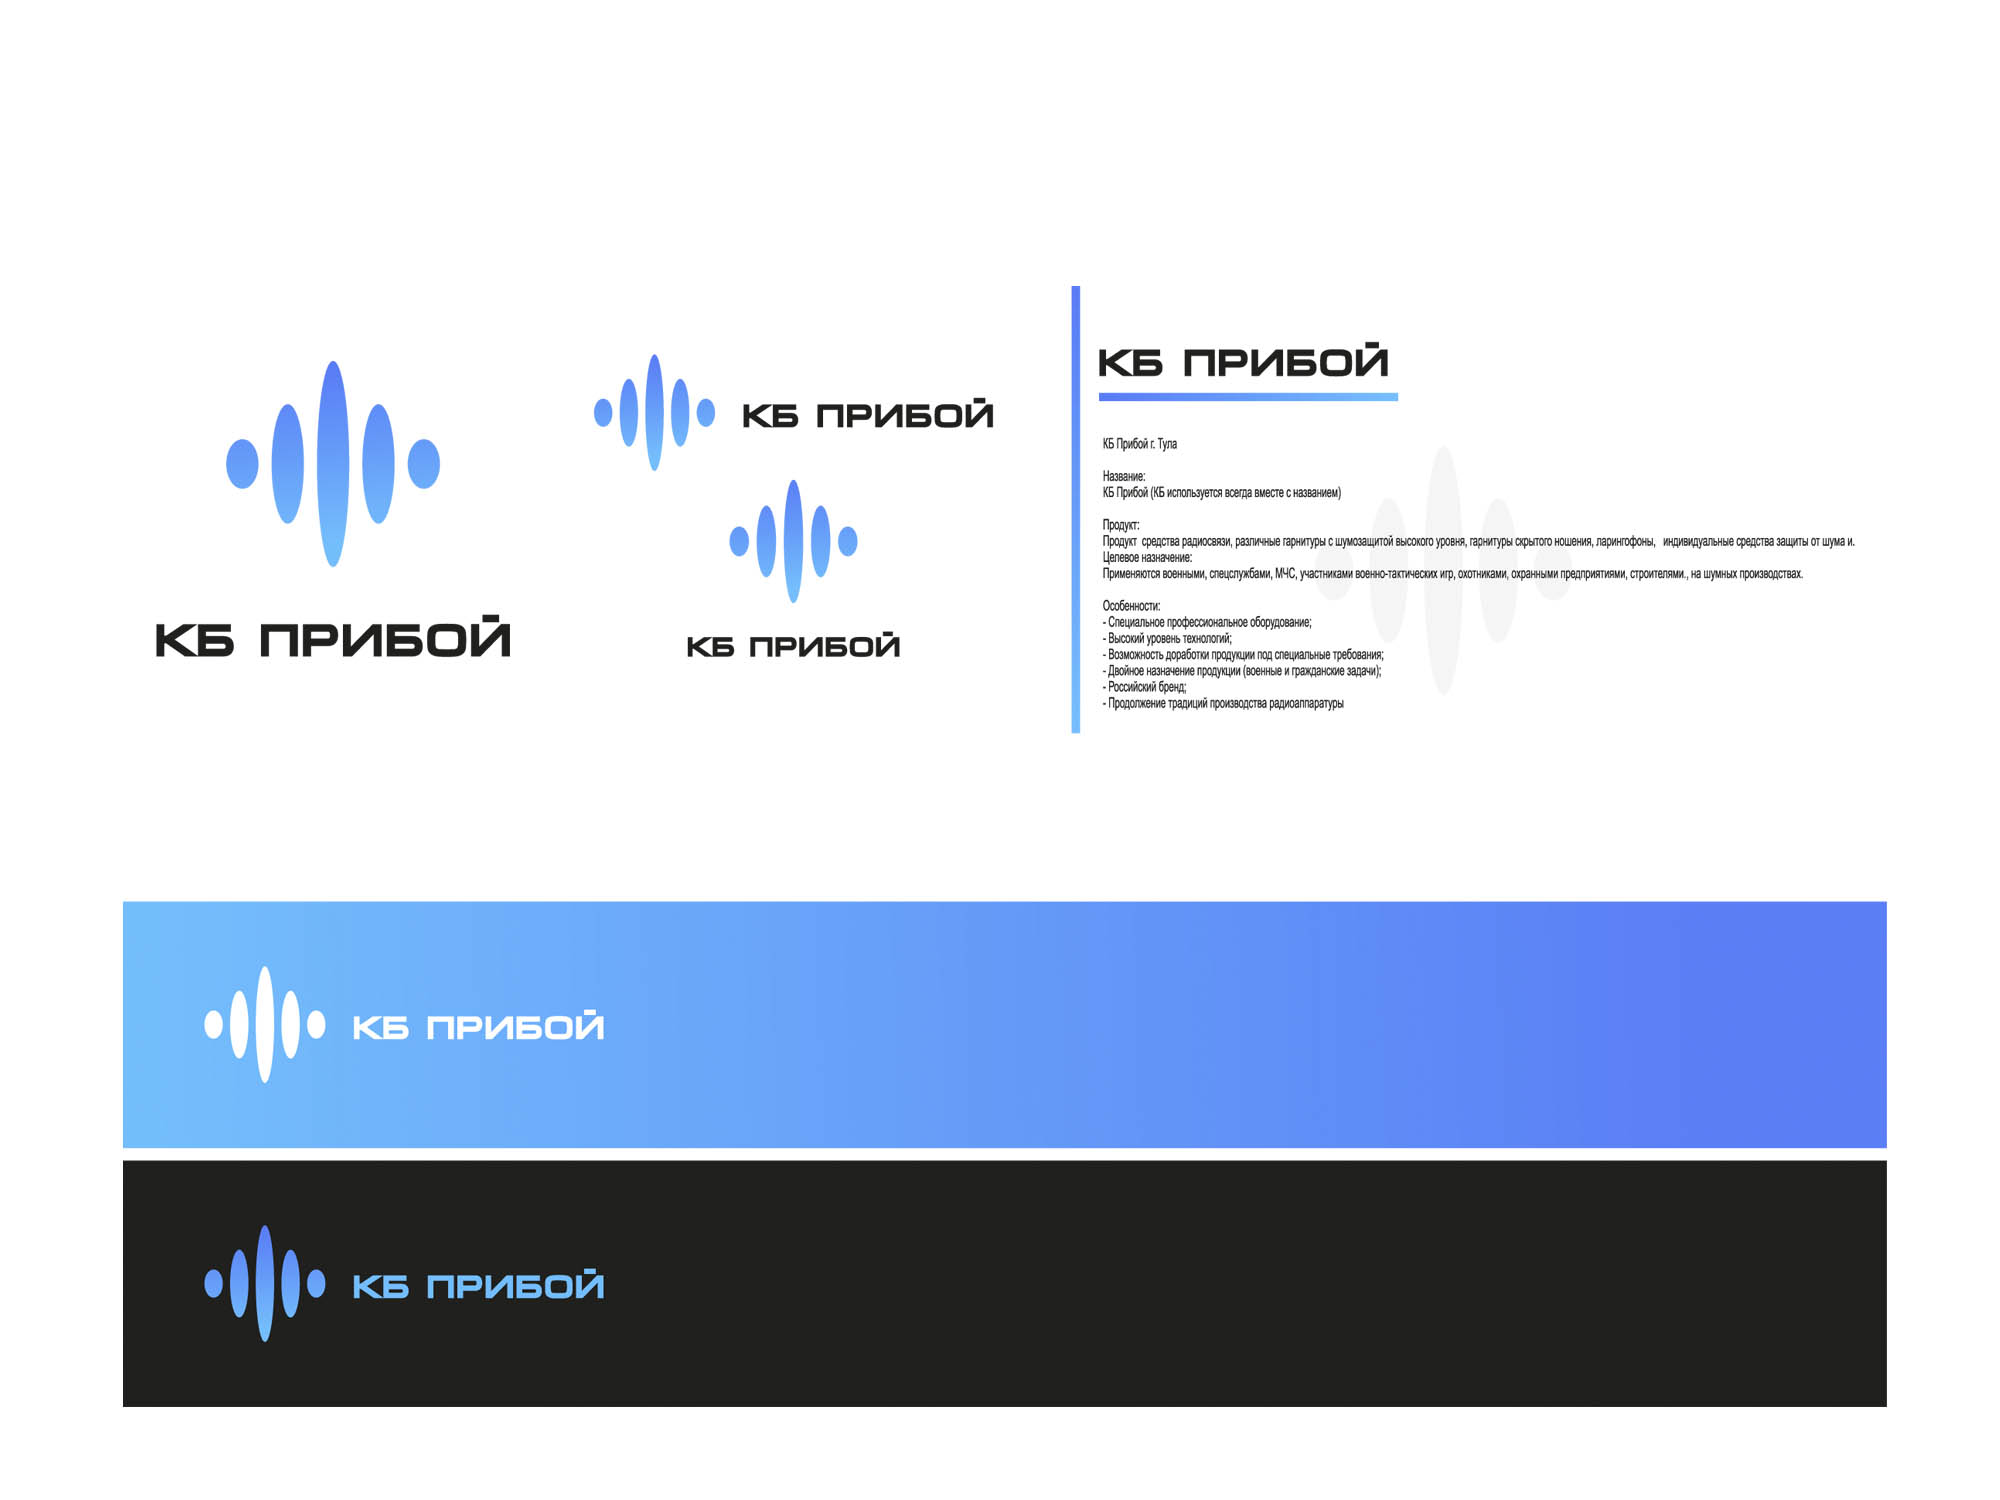 Разработка логотипа и фирменного стиля для КБ Прибой фото f_9535b2671851959b.jpg